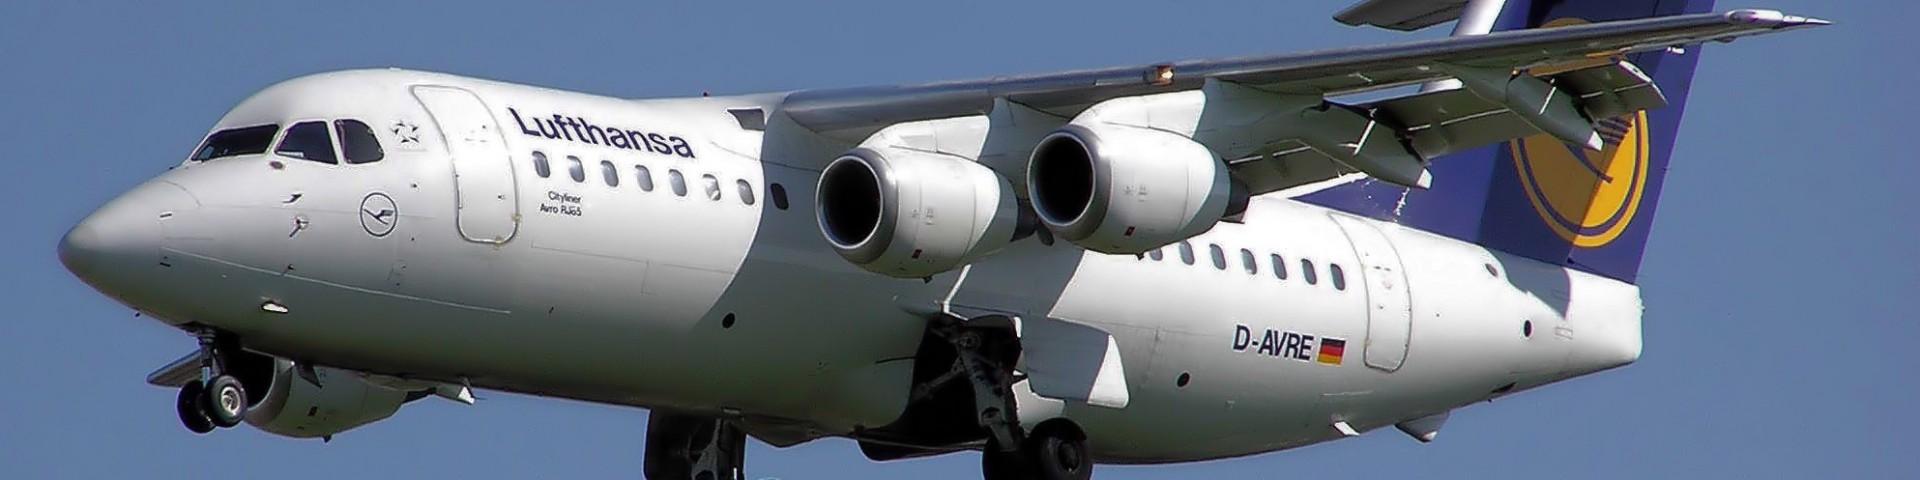 Avro 85 Lufthansa